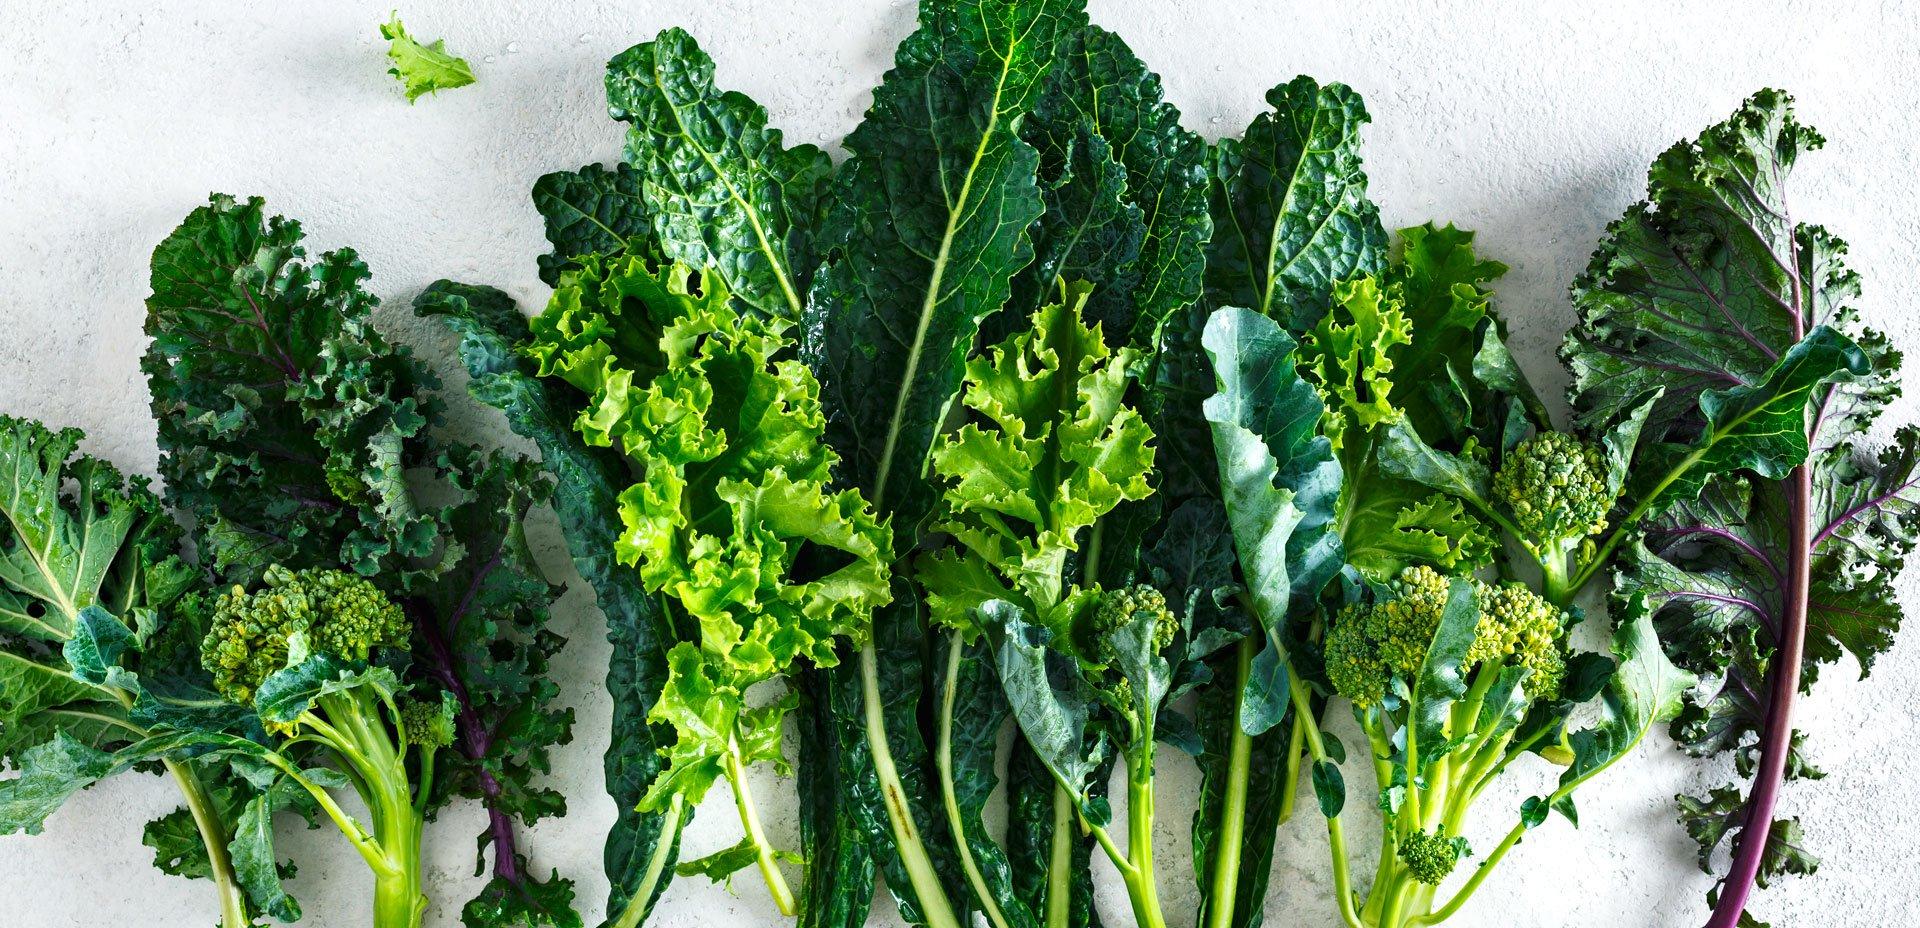 foglie verdi, kale, broccoli